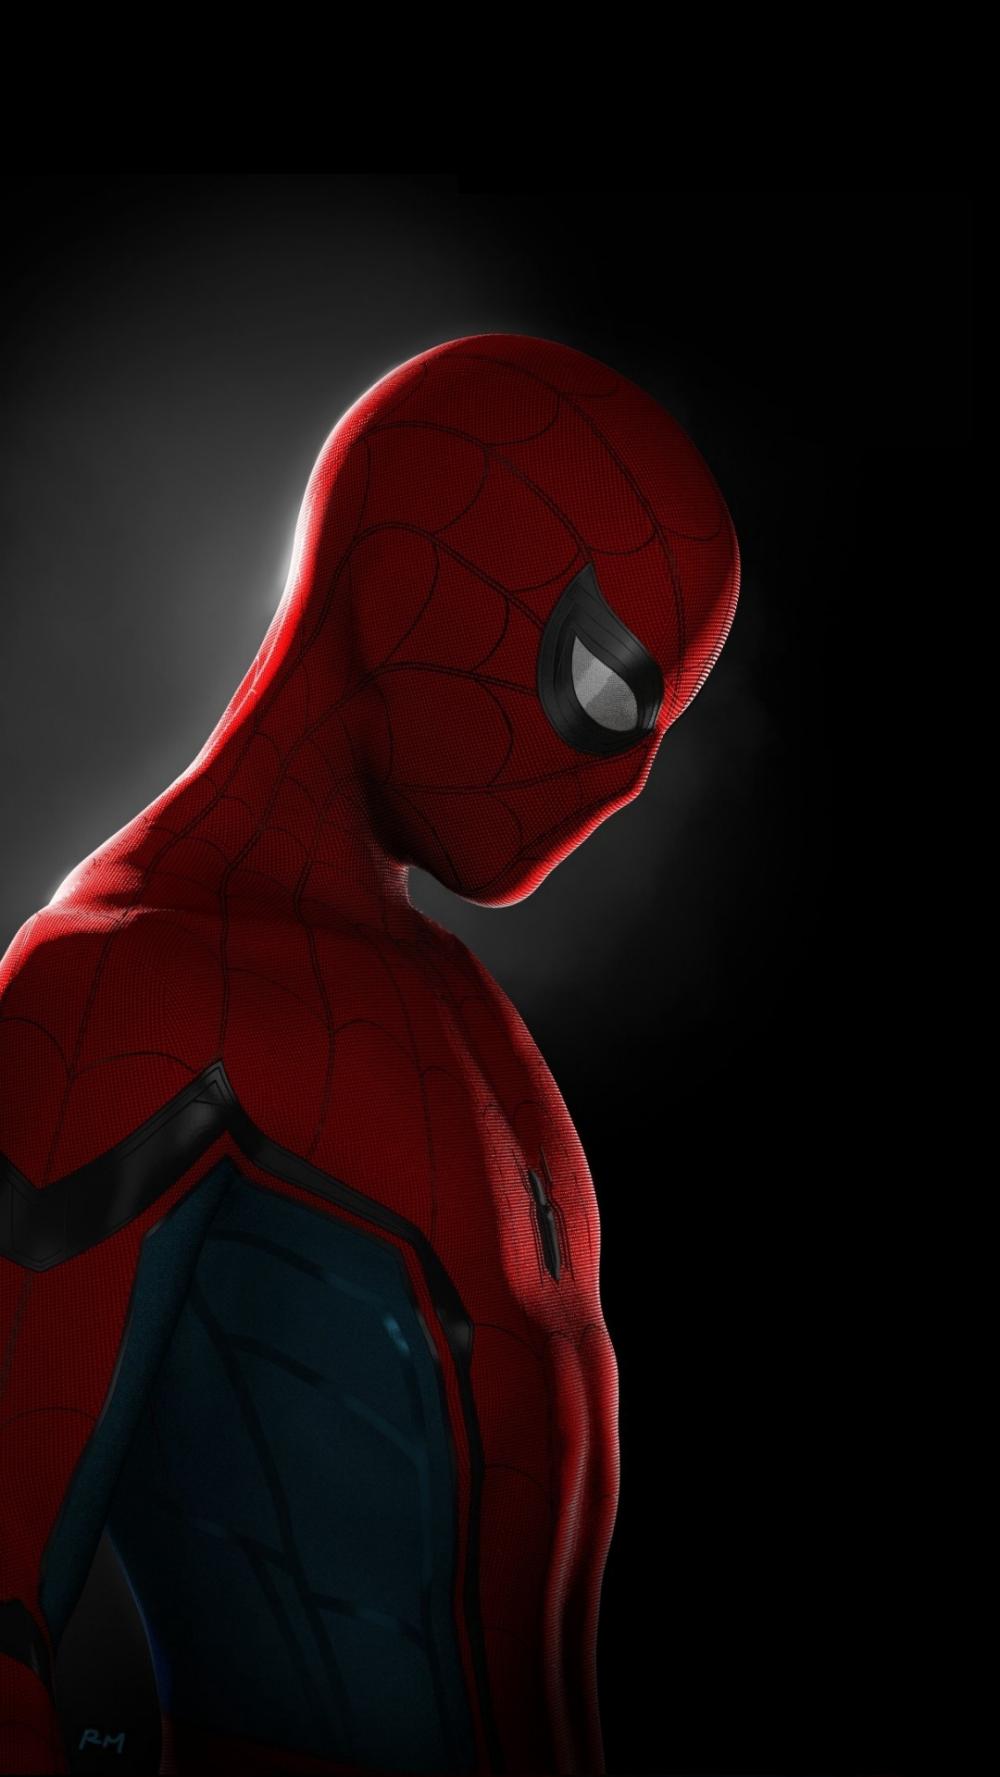 Download 1080x1920 Wallpaper Spider Man Superhero Minimal Artwork Samsung Galaxy S4 S5 Note In 2021 Iphone Wallpaper Hipster Deadpool Wallpaper Spiderman